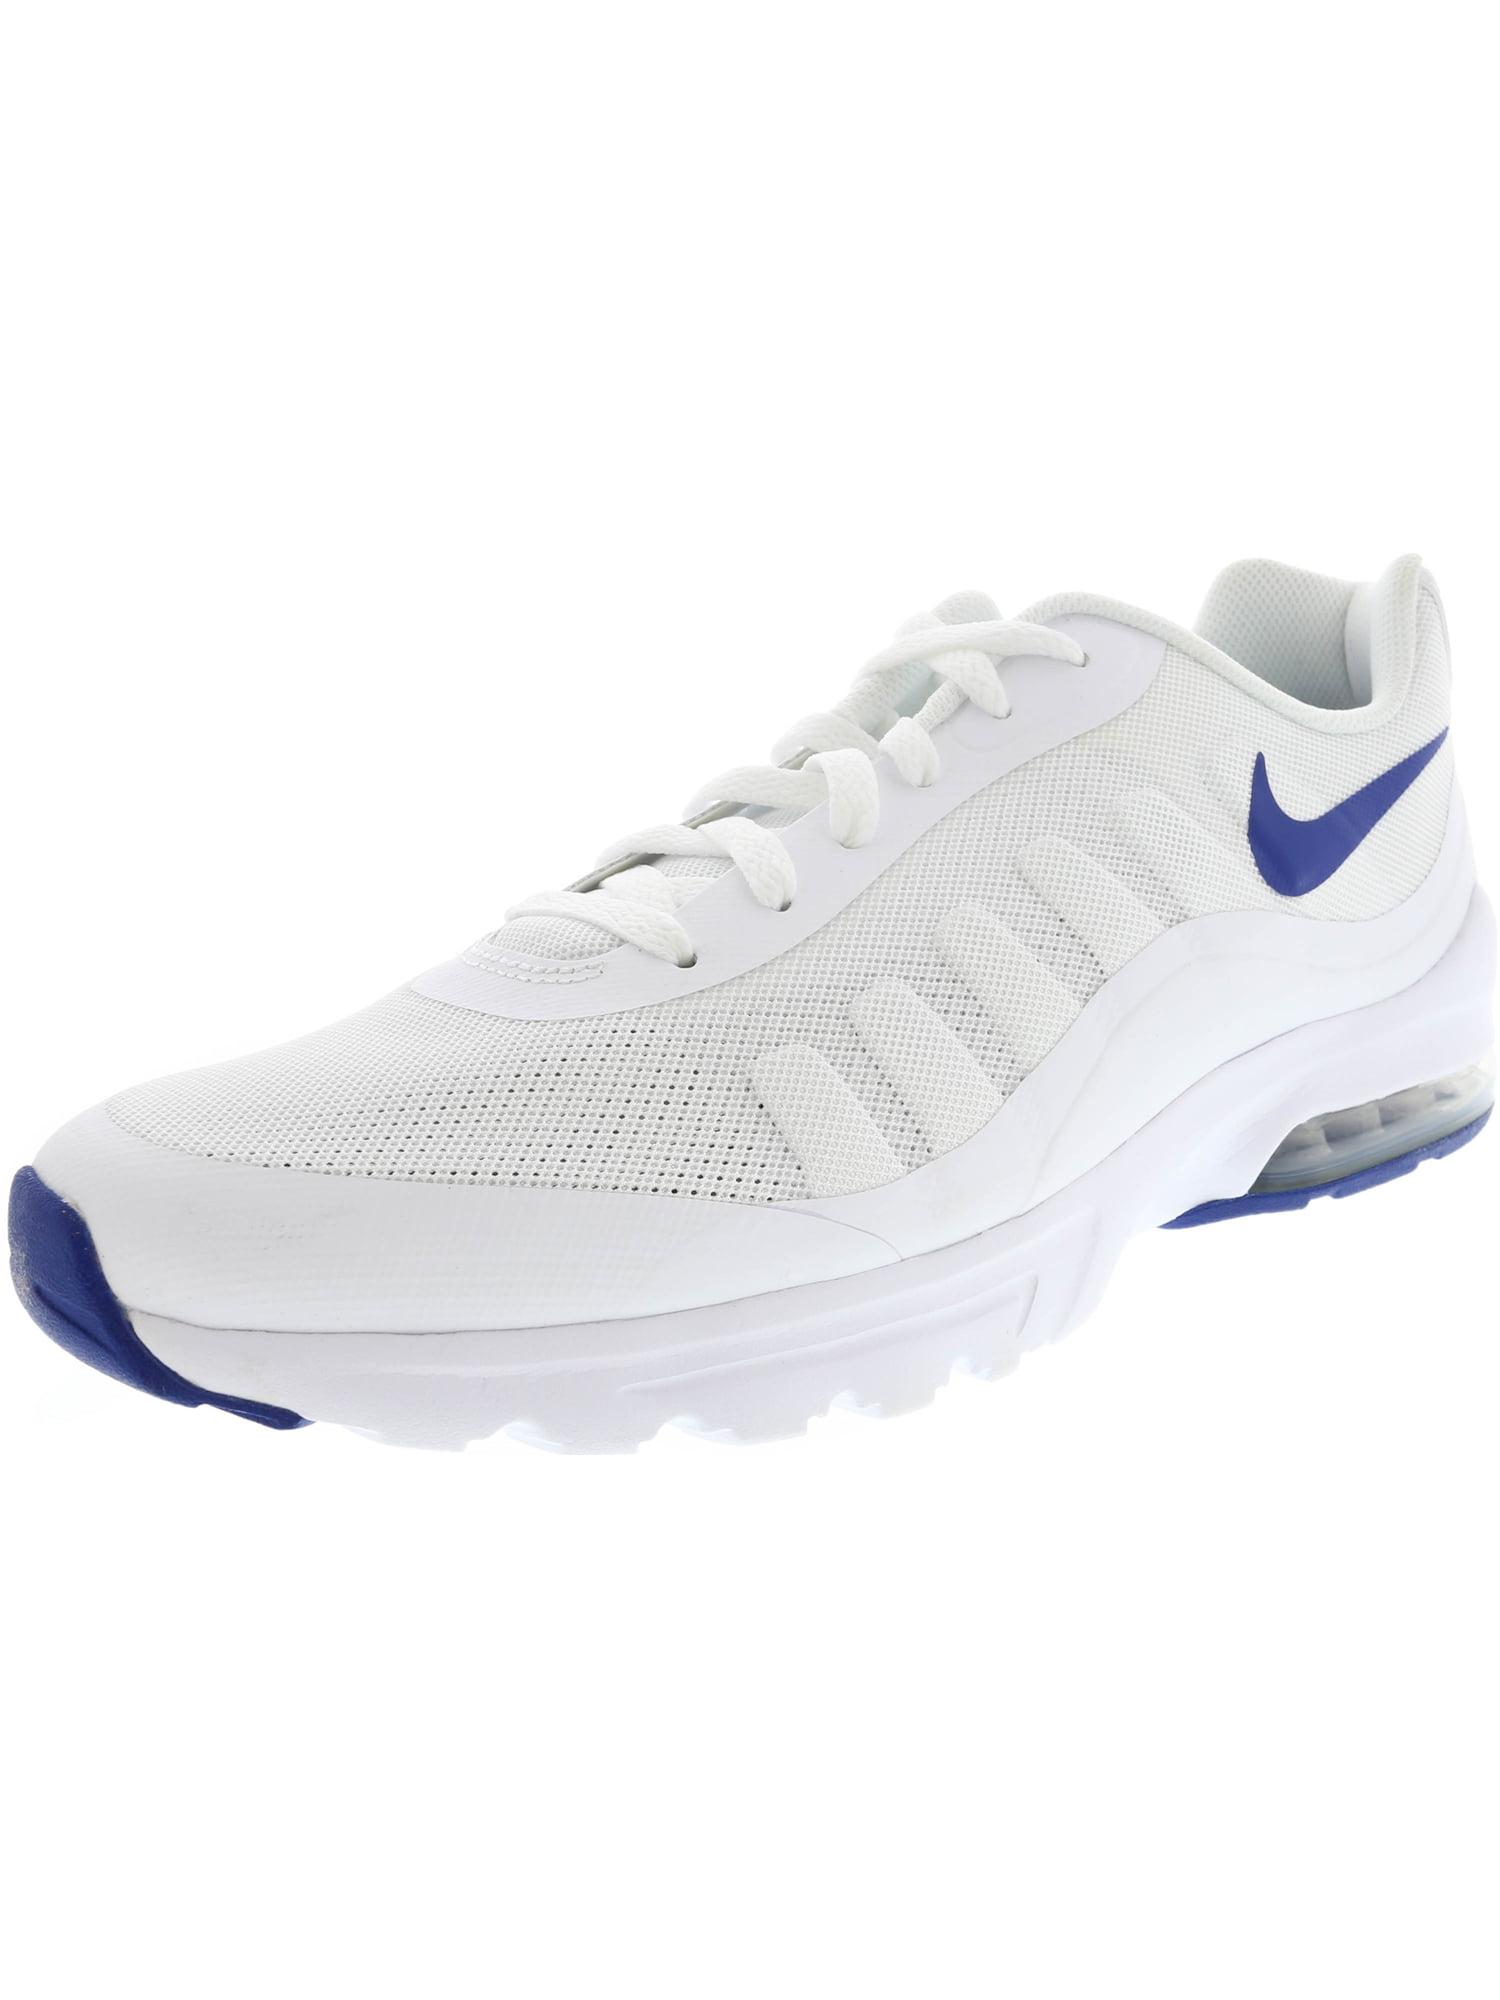 Nike Men's Air Max Invigor White / Gym